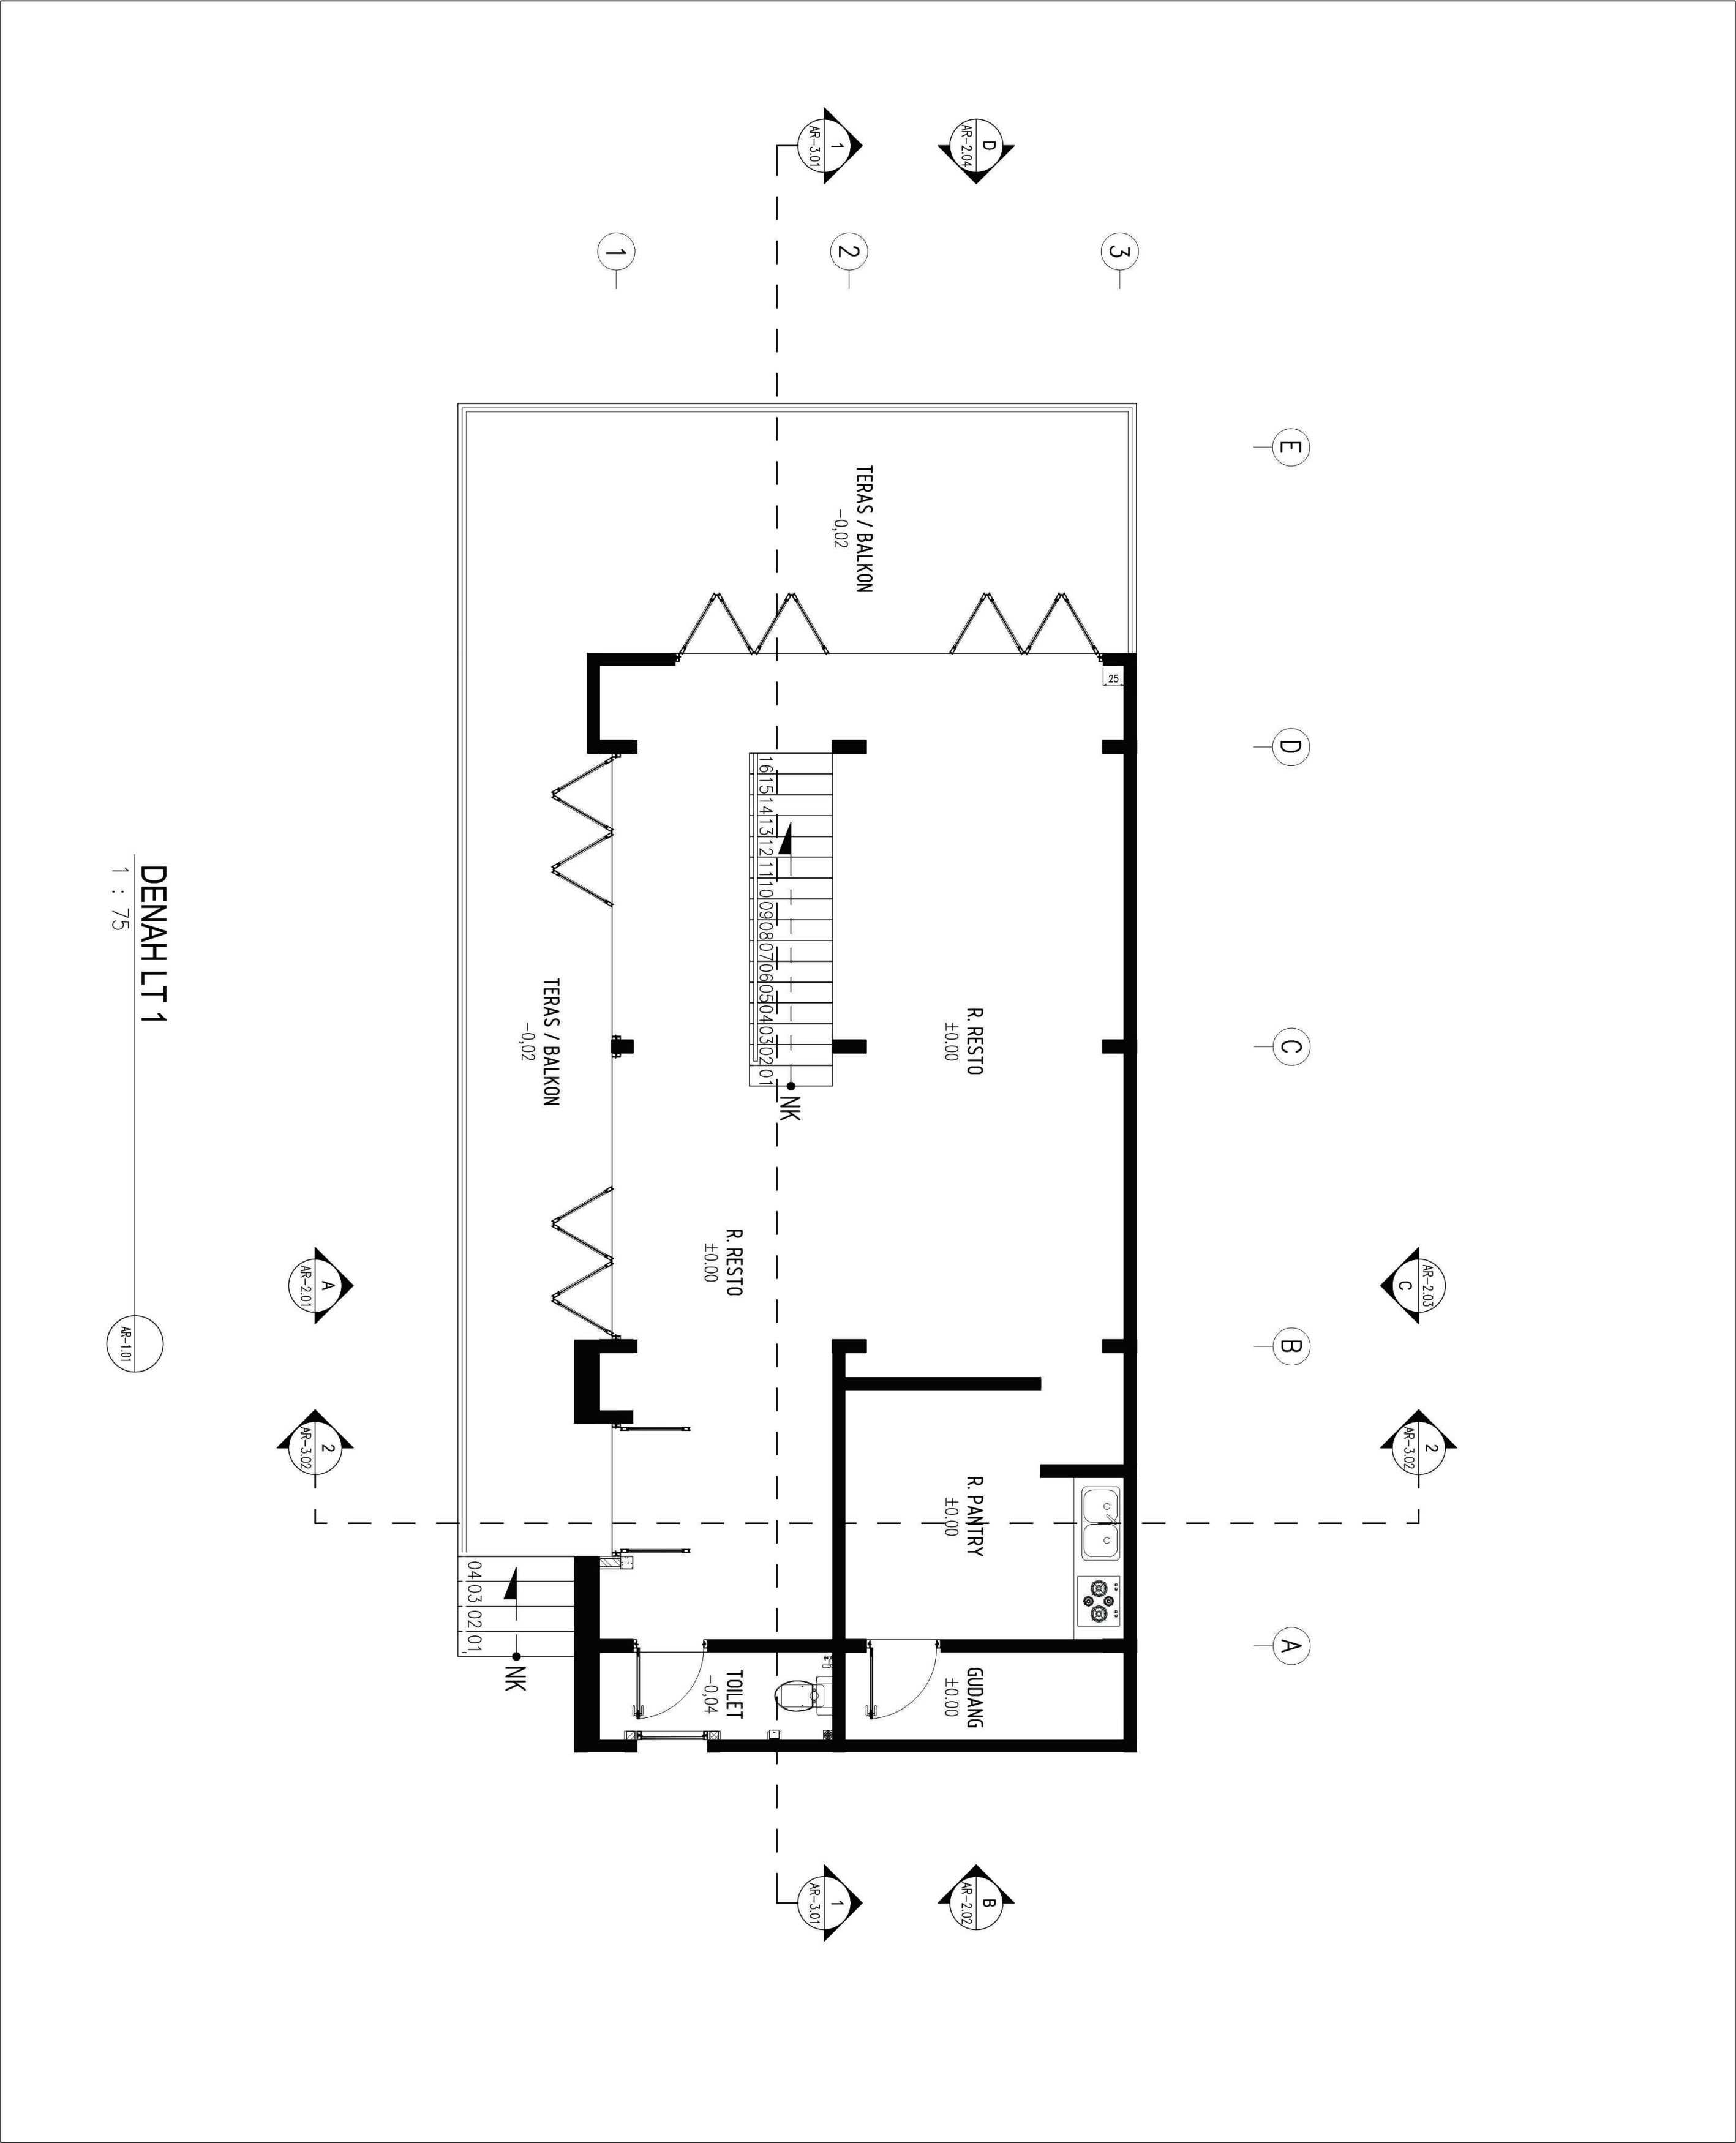 Gubah Ruang Walmar Fabric - Boutique & Resto Bandung, Kota Bandung, Jawa Barat, Indonesia Bandung, Kota Bandung, Jawa Barat, Indonesia Floorplan   51075